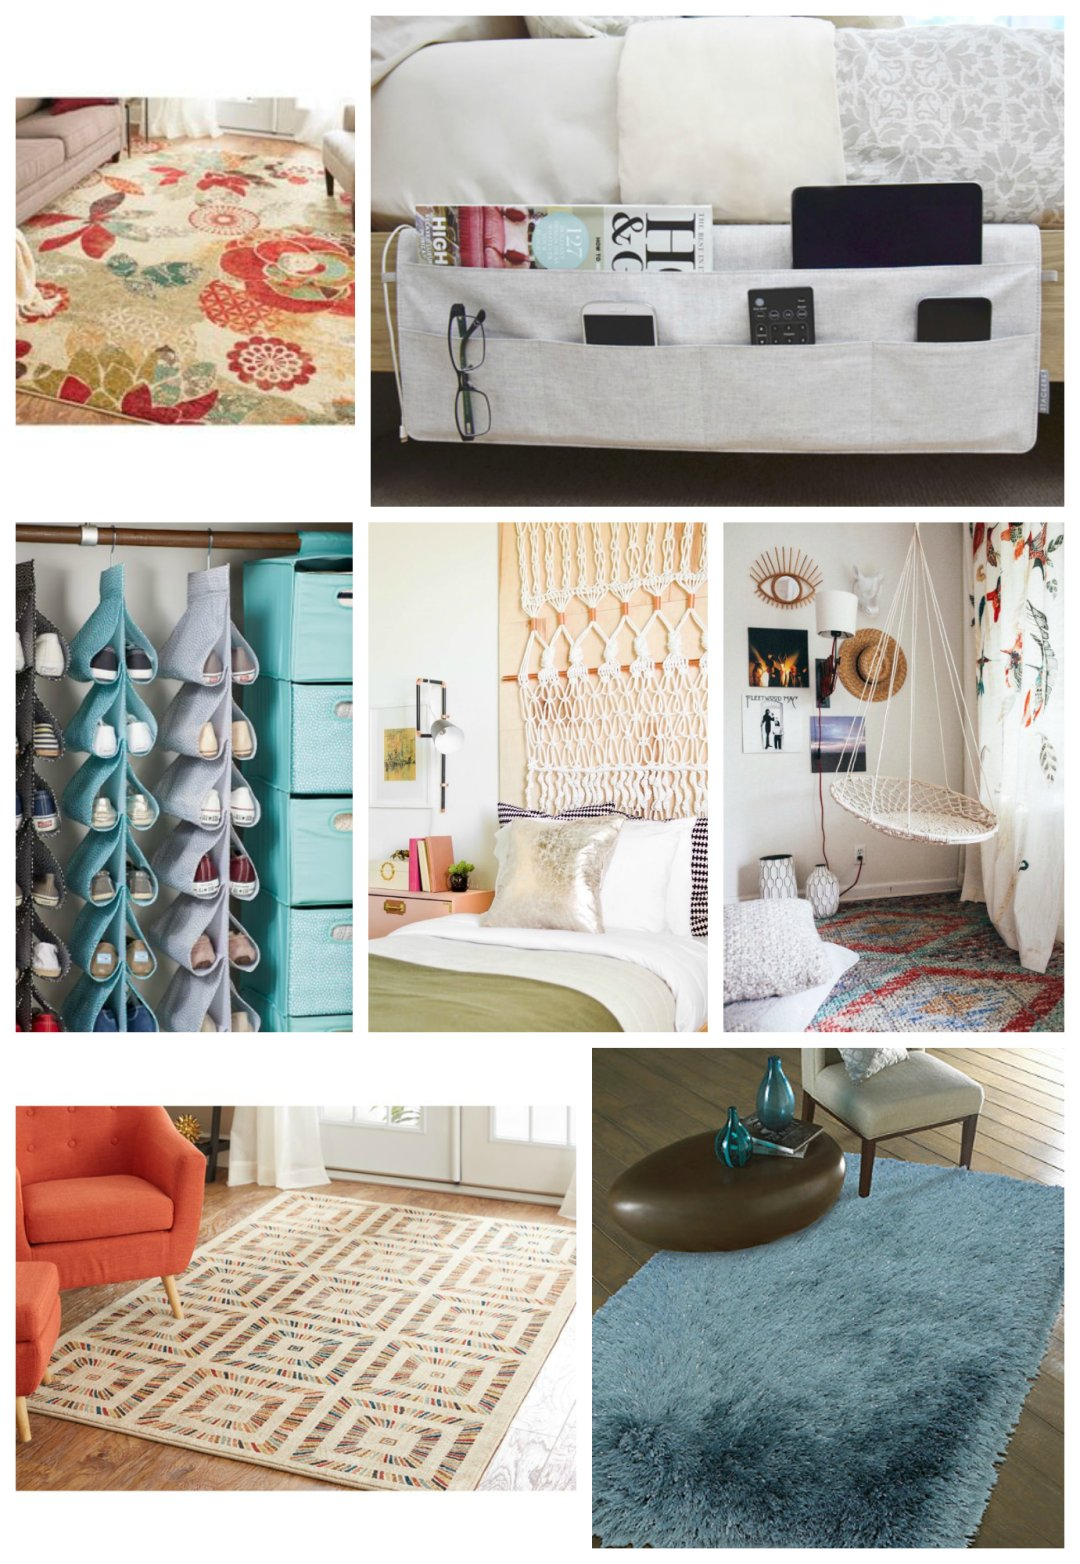 dorm room decor mood board mohawk homescapes. Black Bedroom Furniture Sets. Home Design Ideas